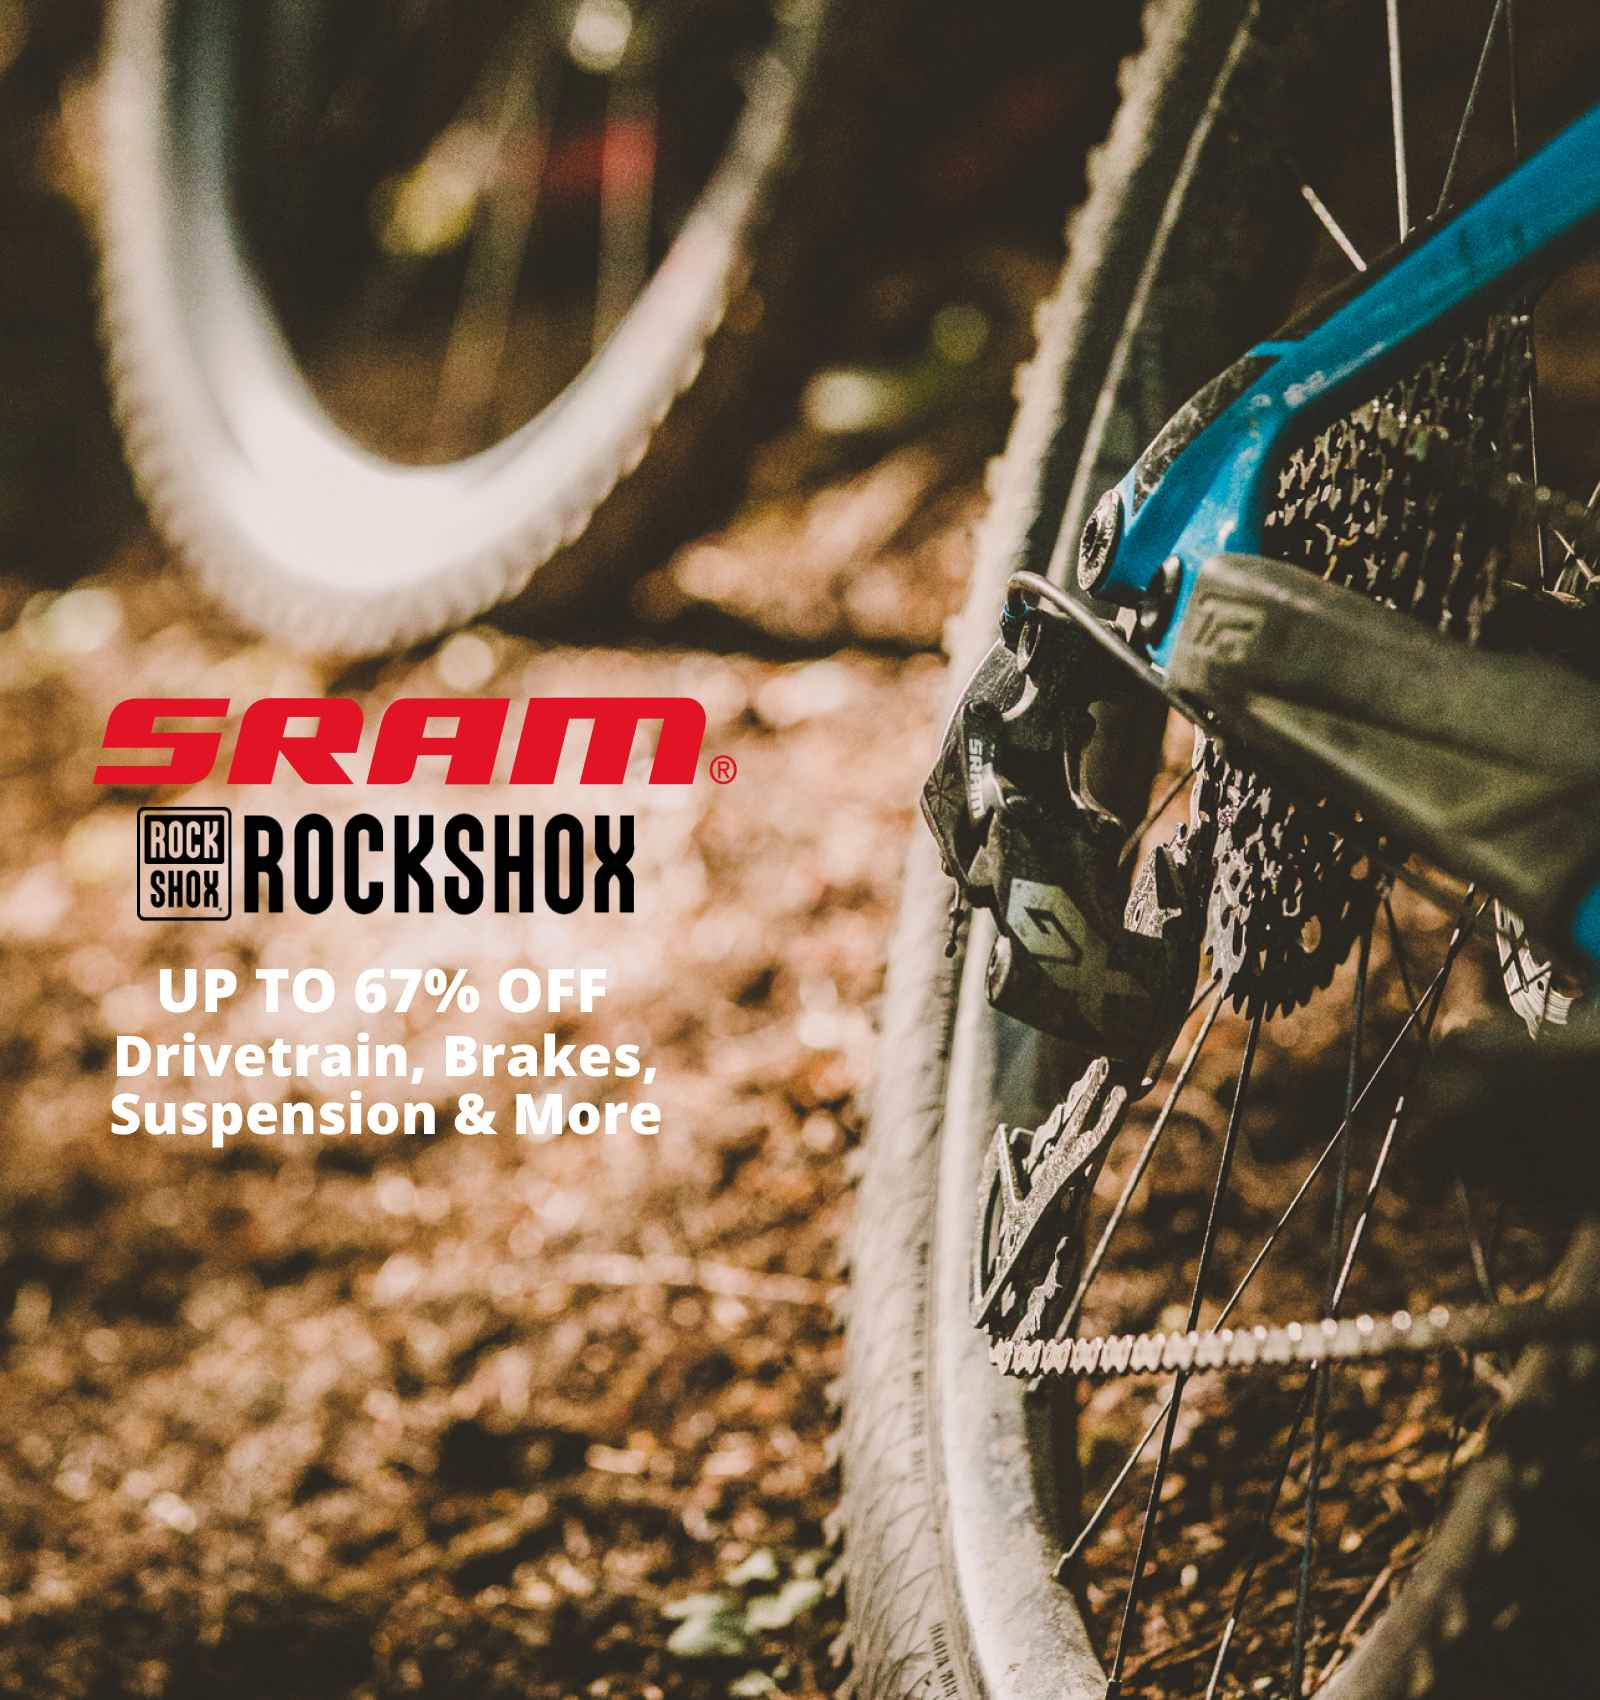 Sram & Rockshox